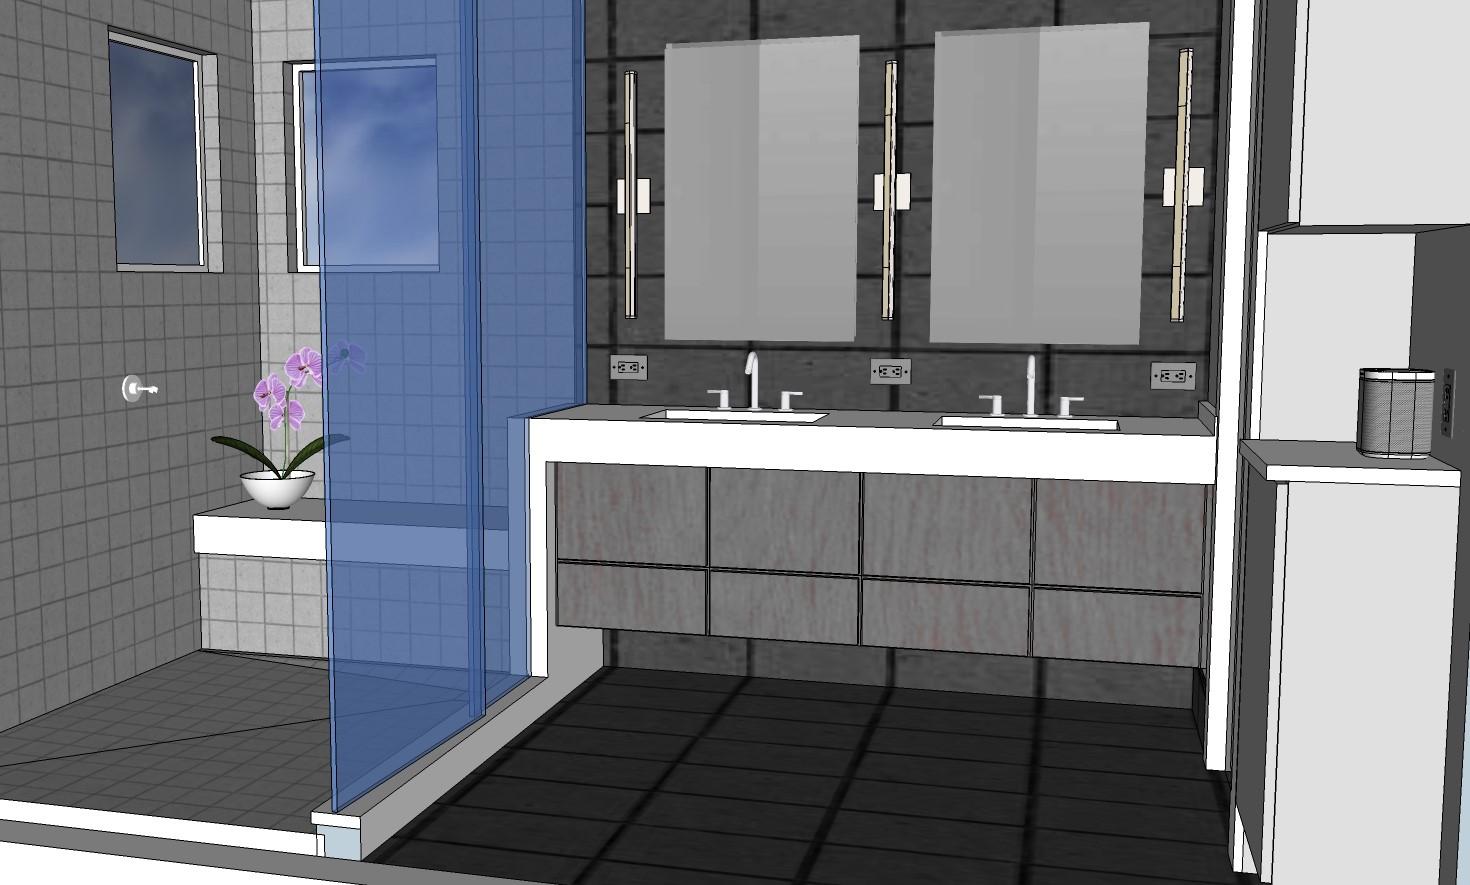 2016-01-10 designgene, DC modern, DC modern bath, modern bathroom, big shower remodel, waterfall counter, bathroom remodel,  (7).jpg